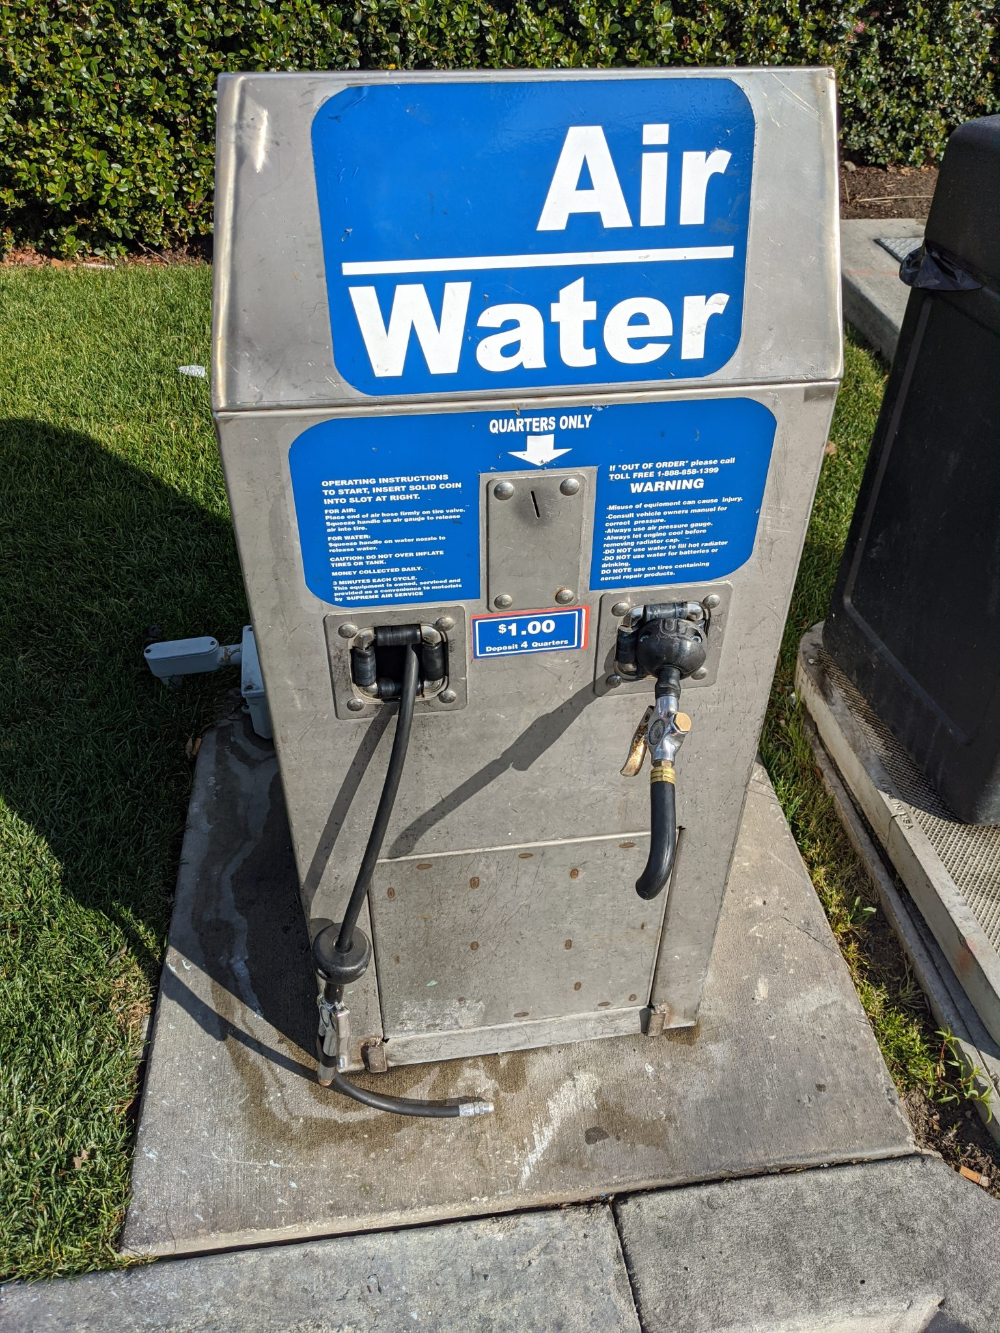 Costco アメリカでタイヤ空気圧チェック 空気入れ 無料でできます Aco Blog 空気圧 タイヤ ガソリンスタンド